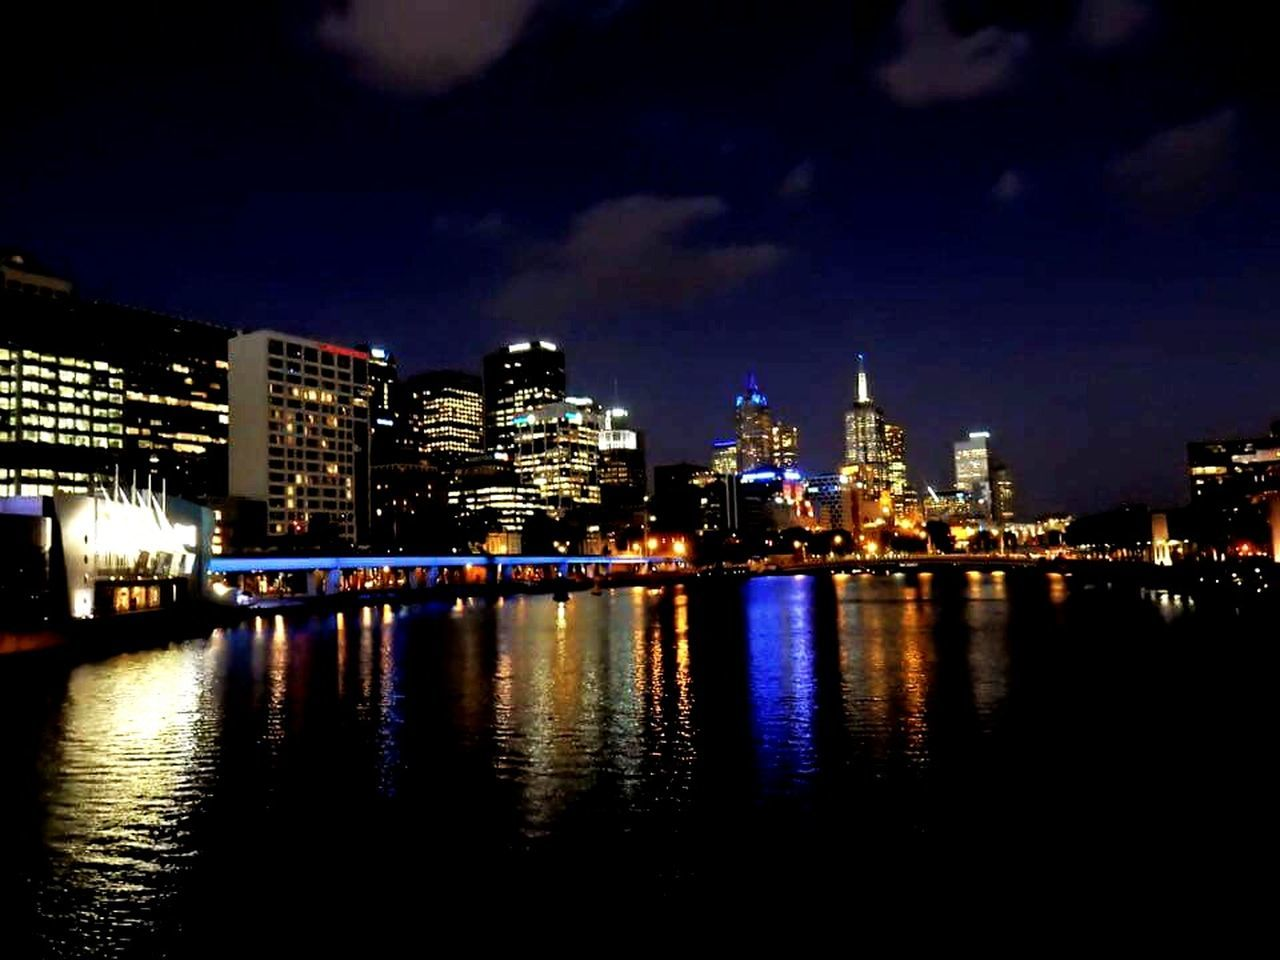 Night City Australia Melbourne Southbank 호주 멜버른 사우스뱅크